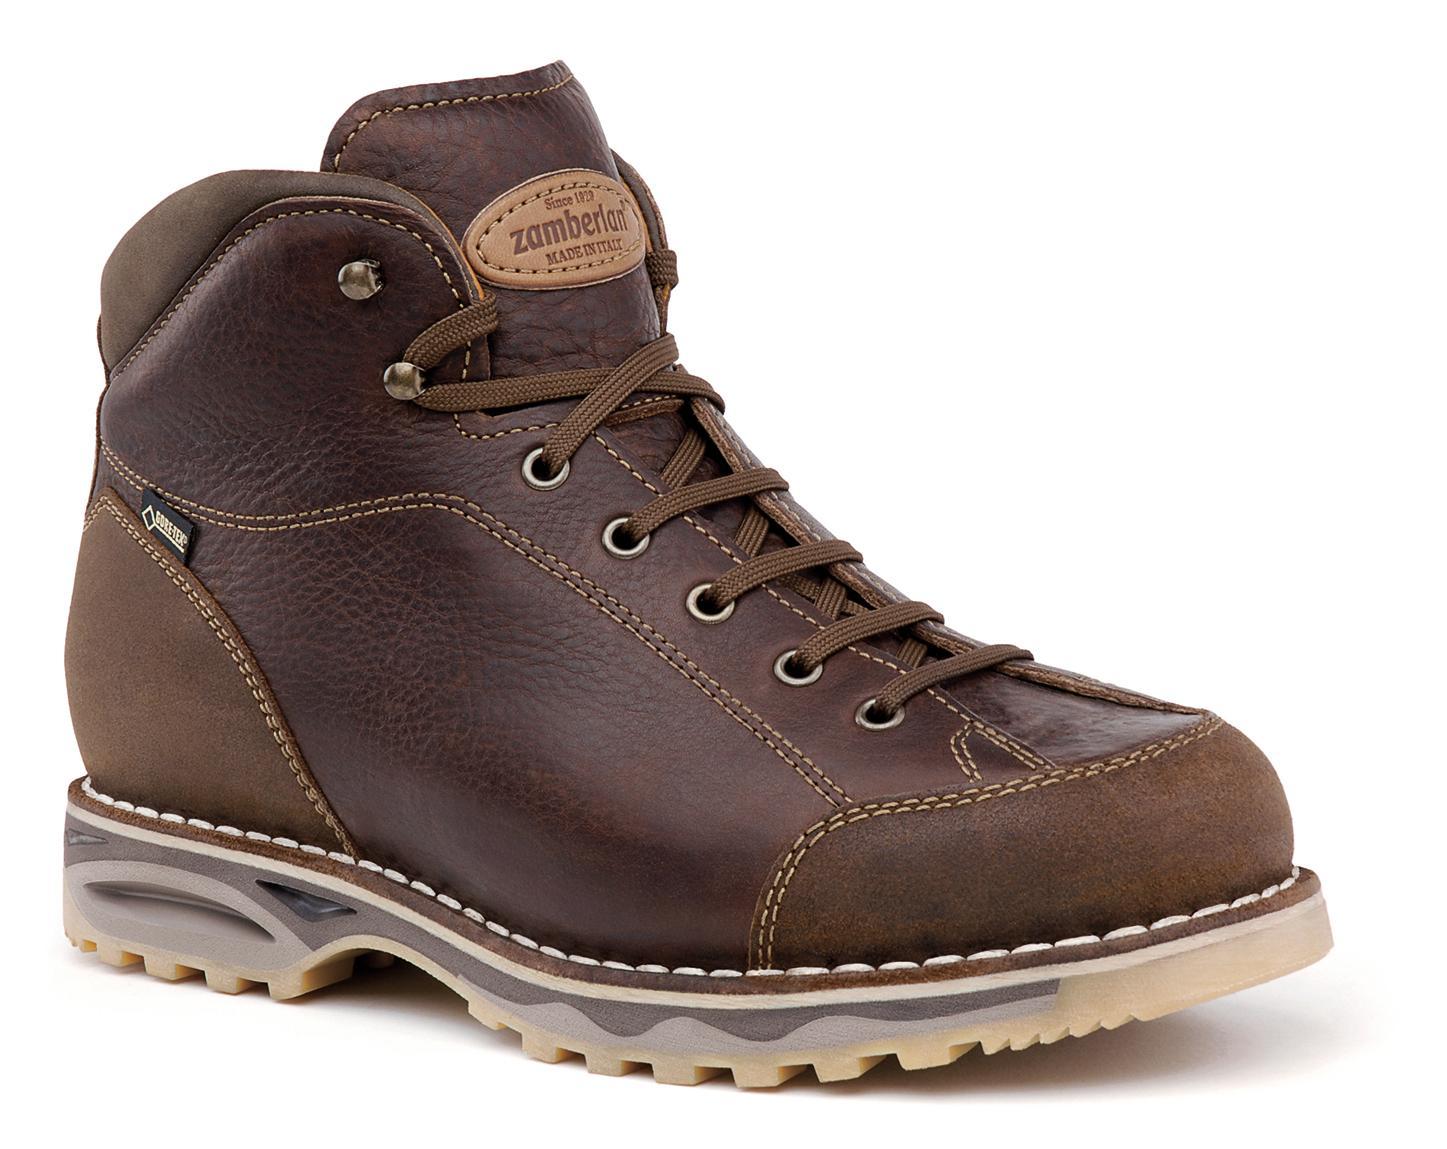 1032 SOLDA NW GTX   -   Scarponi  Hiking   -   Chestnut